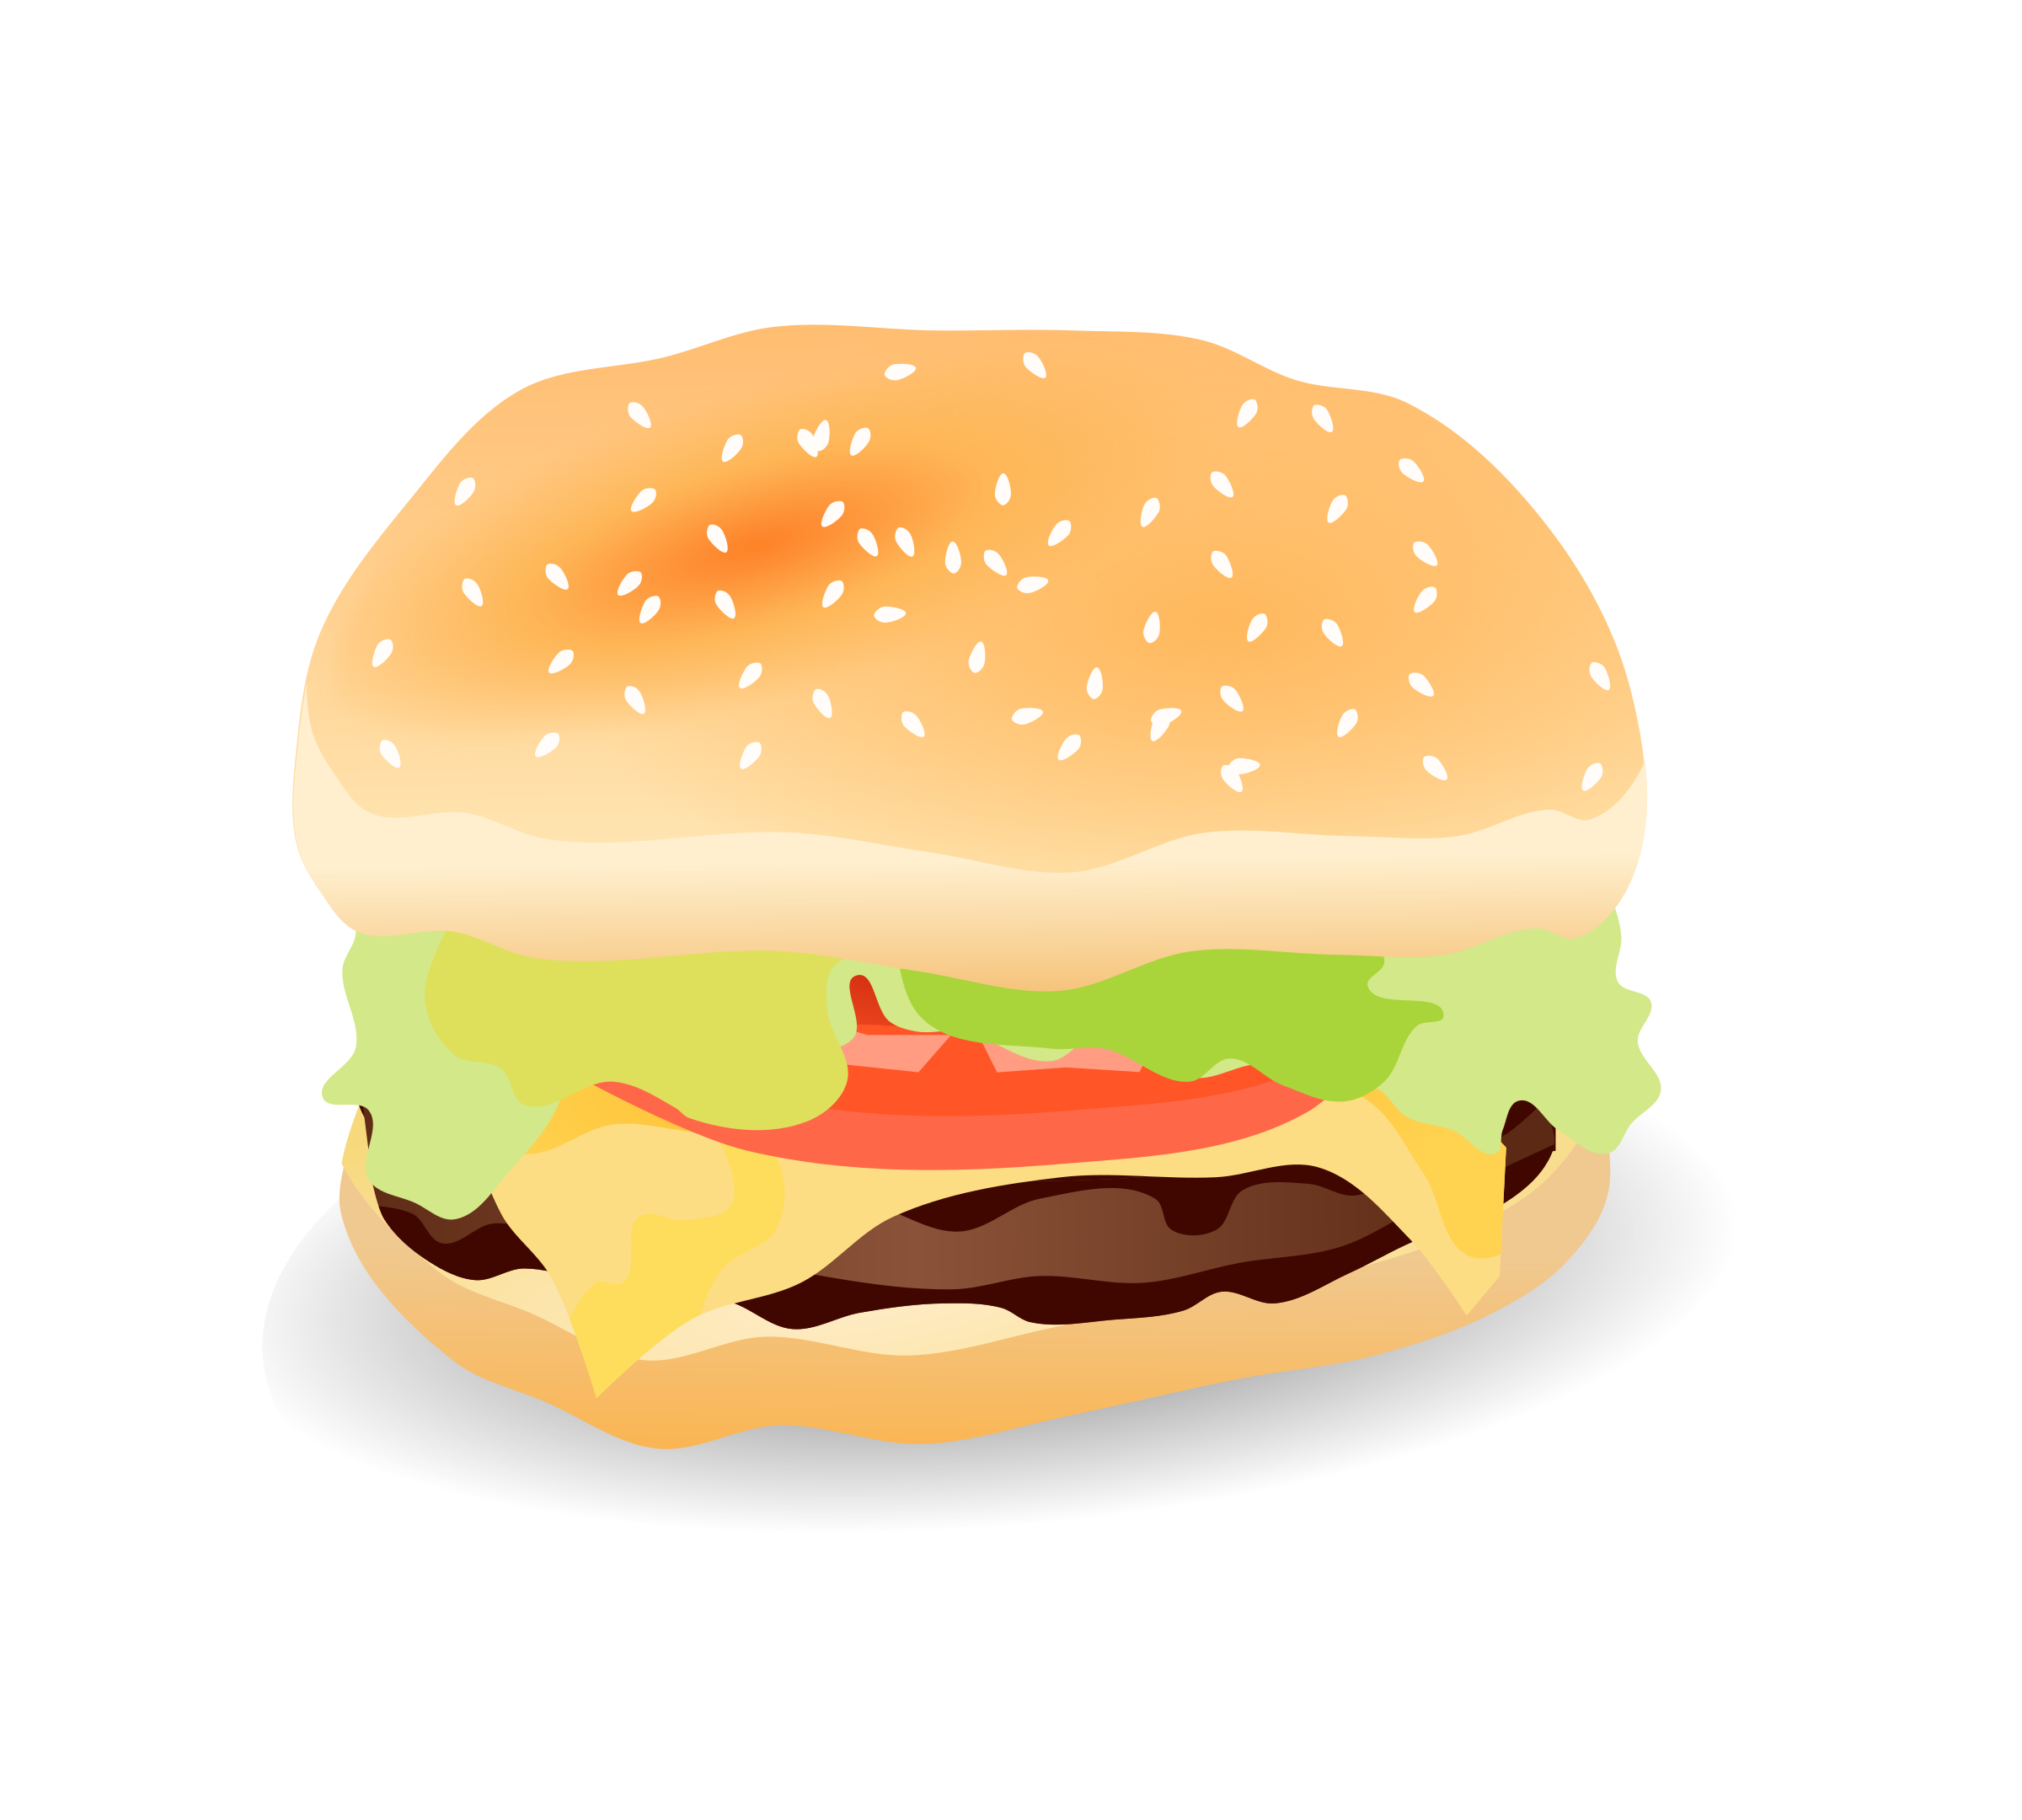 Cheeseburger clipart cheesburger.